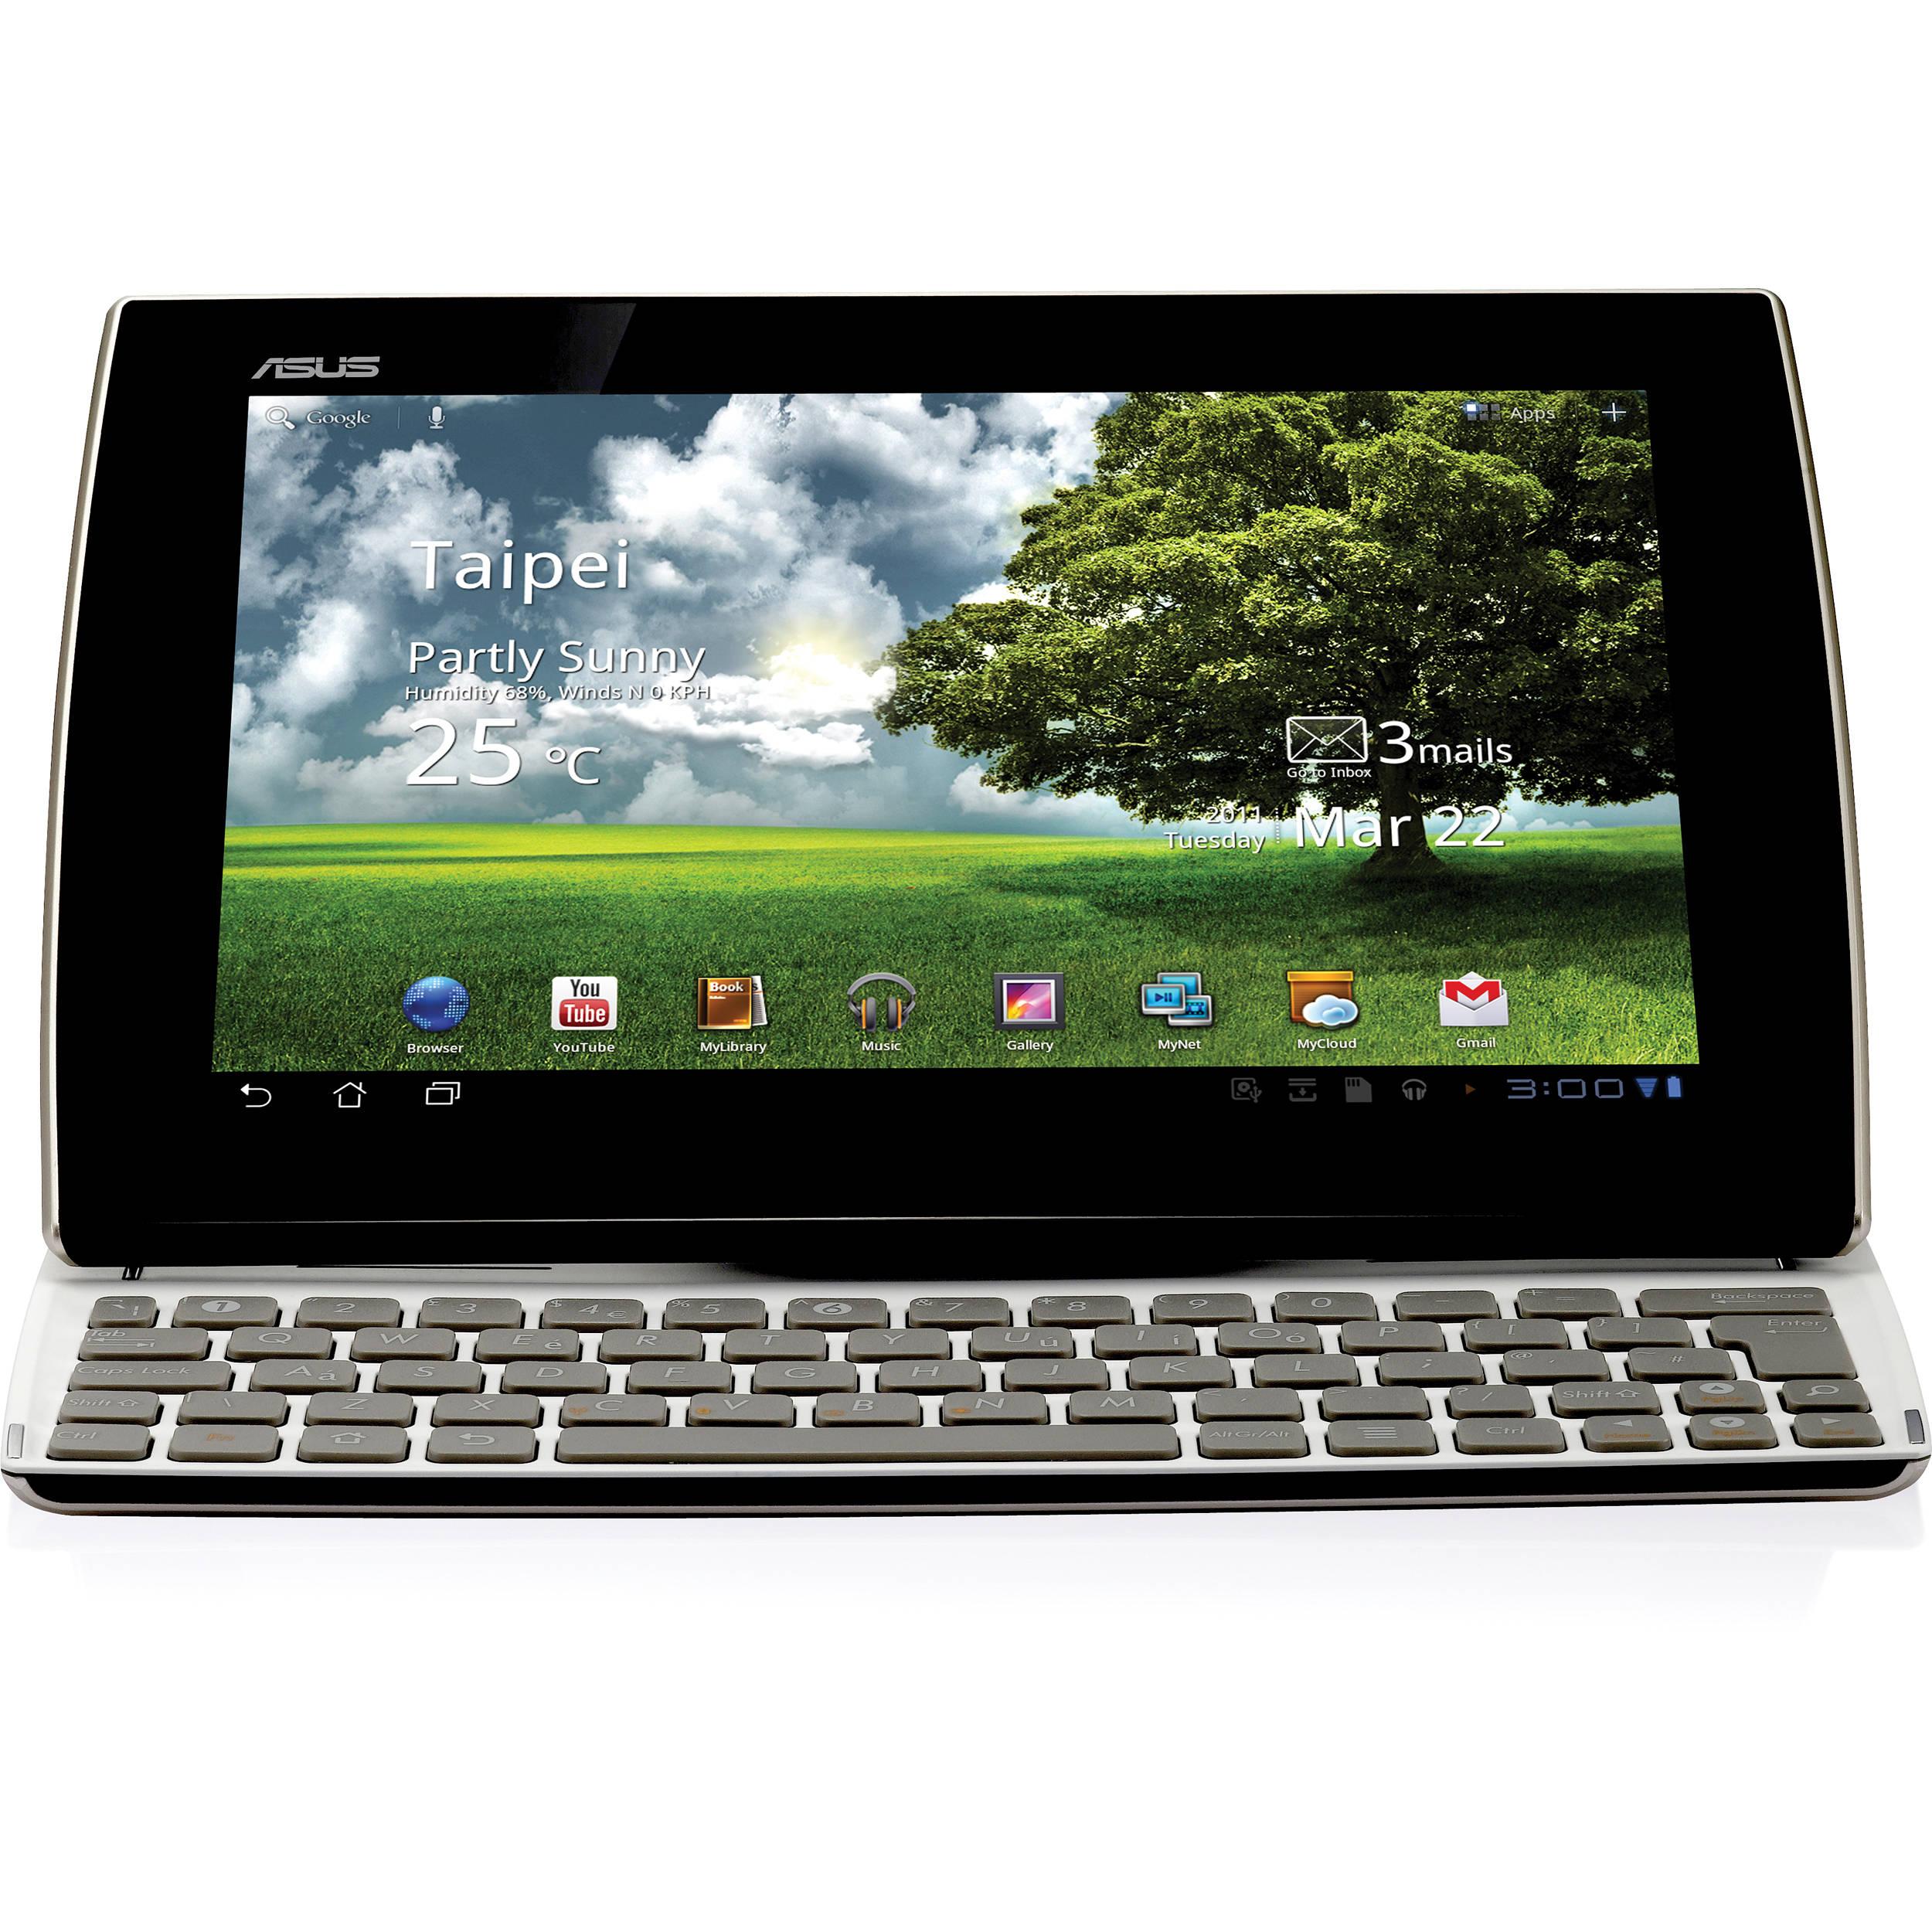 asus 16gb eee pad slider sl101 tablet pearl white sl101 a1 wt rh bhphotovideo com Asus Transformer Pad Infinity TF700T Asus Eee Pad Transformer Prime